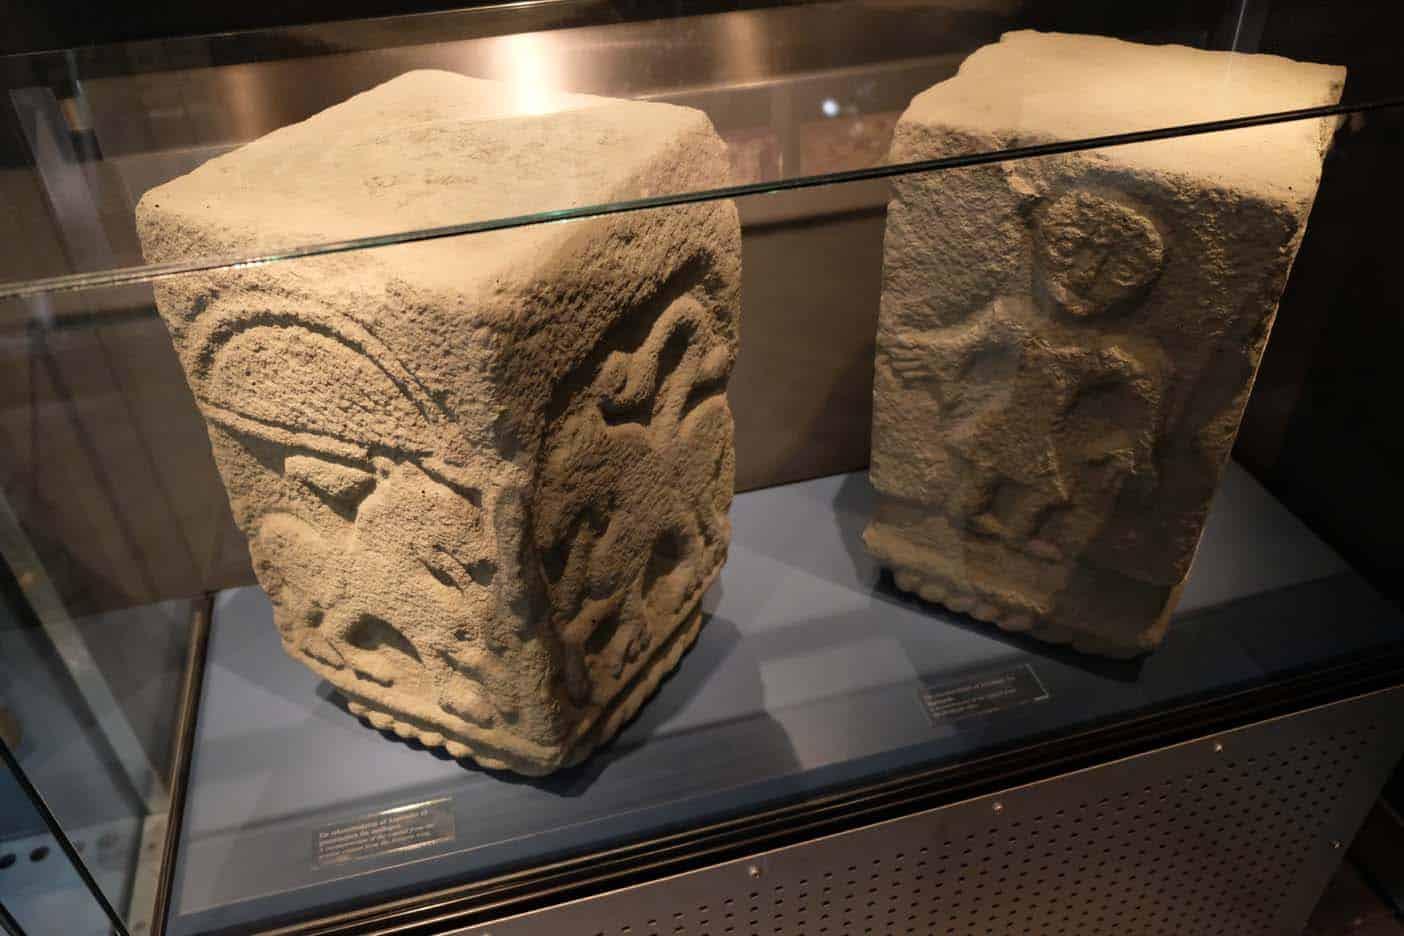 Graabrodrekloster Museum